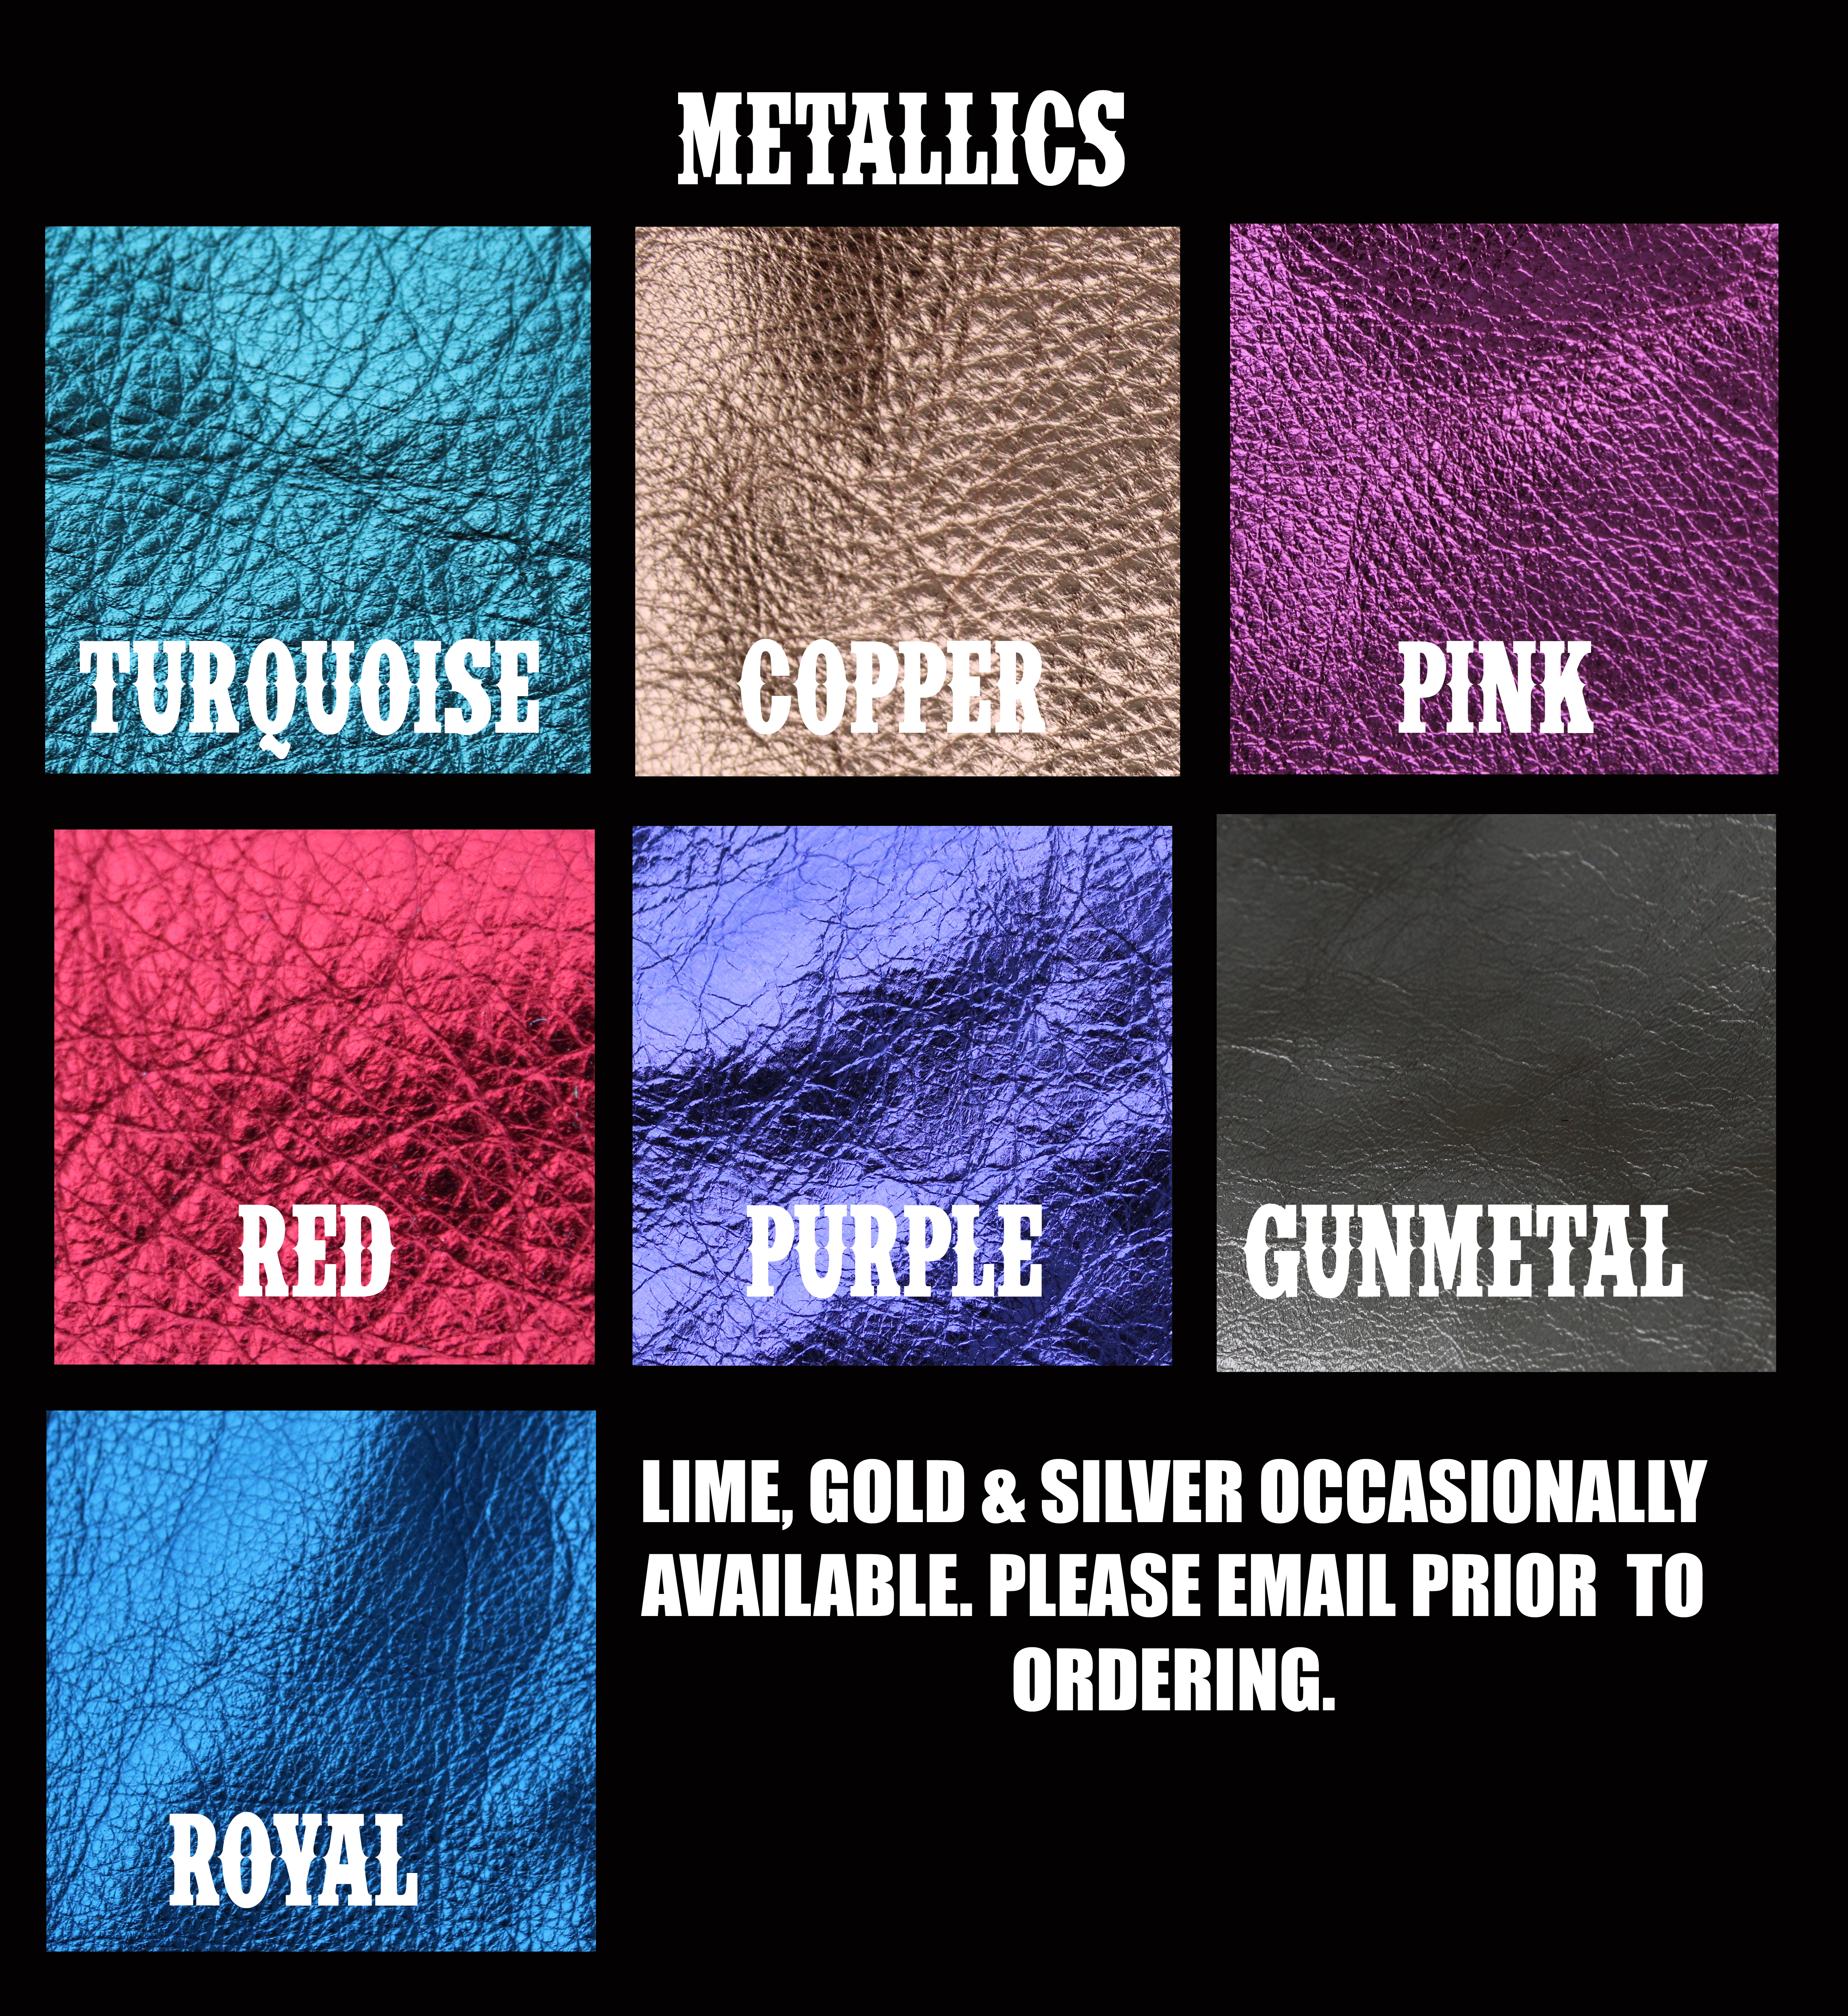 metallicfringe-copy.jpg